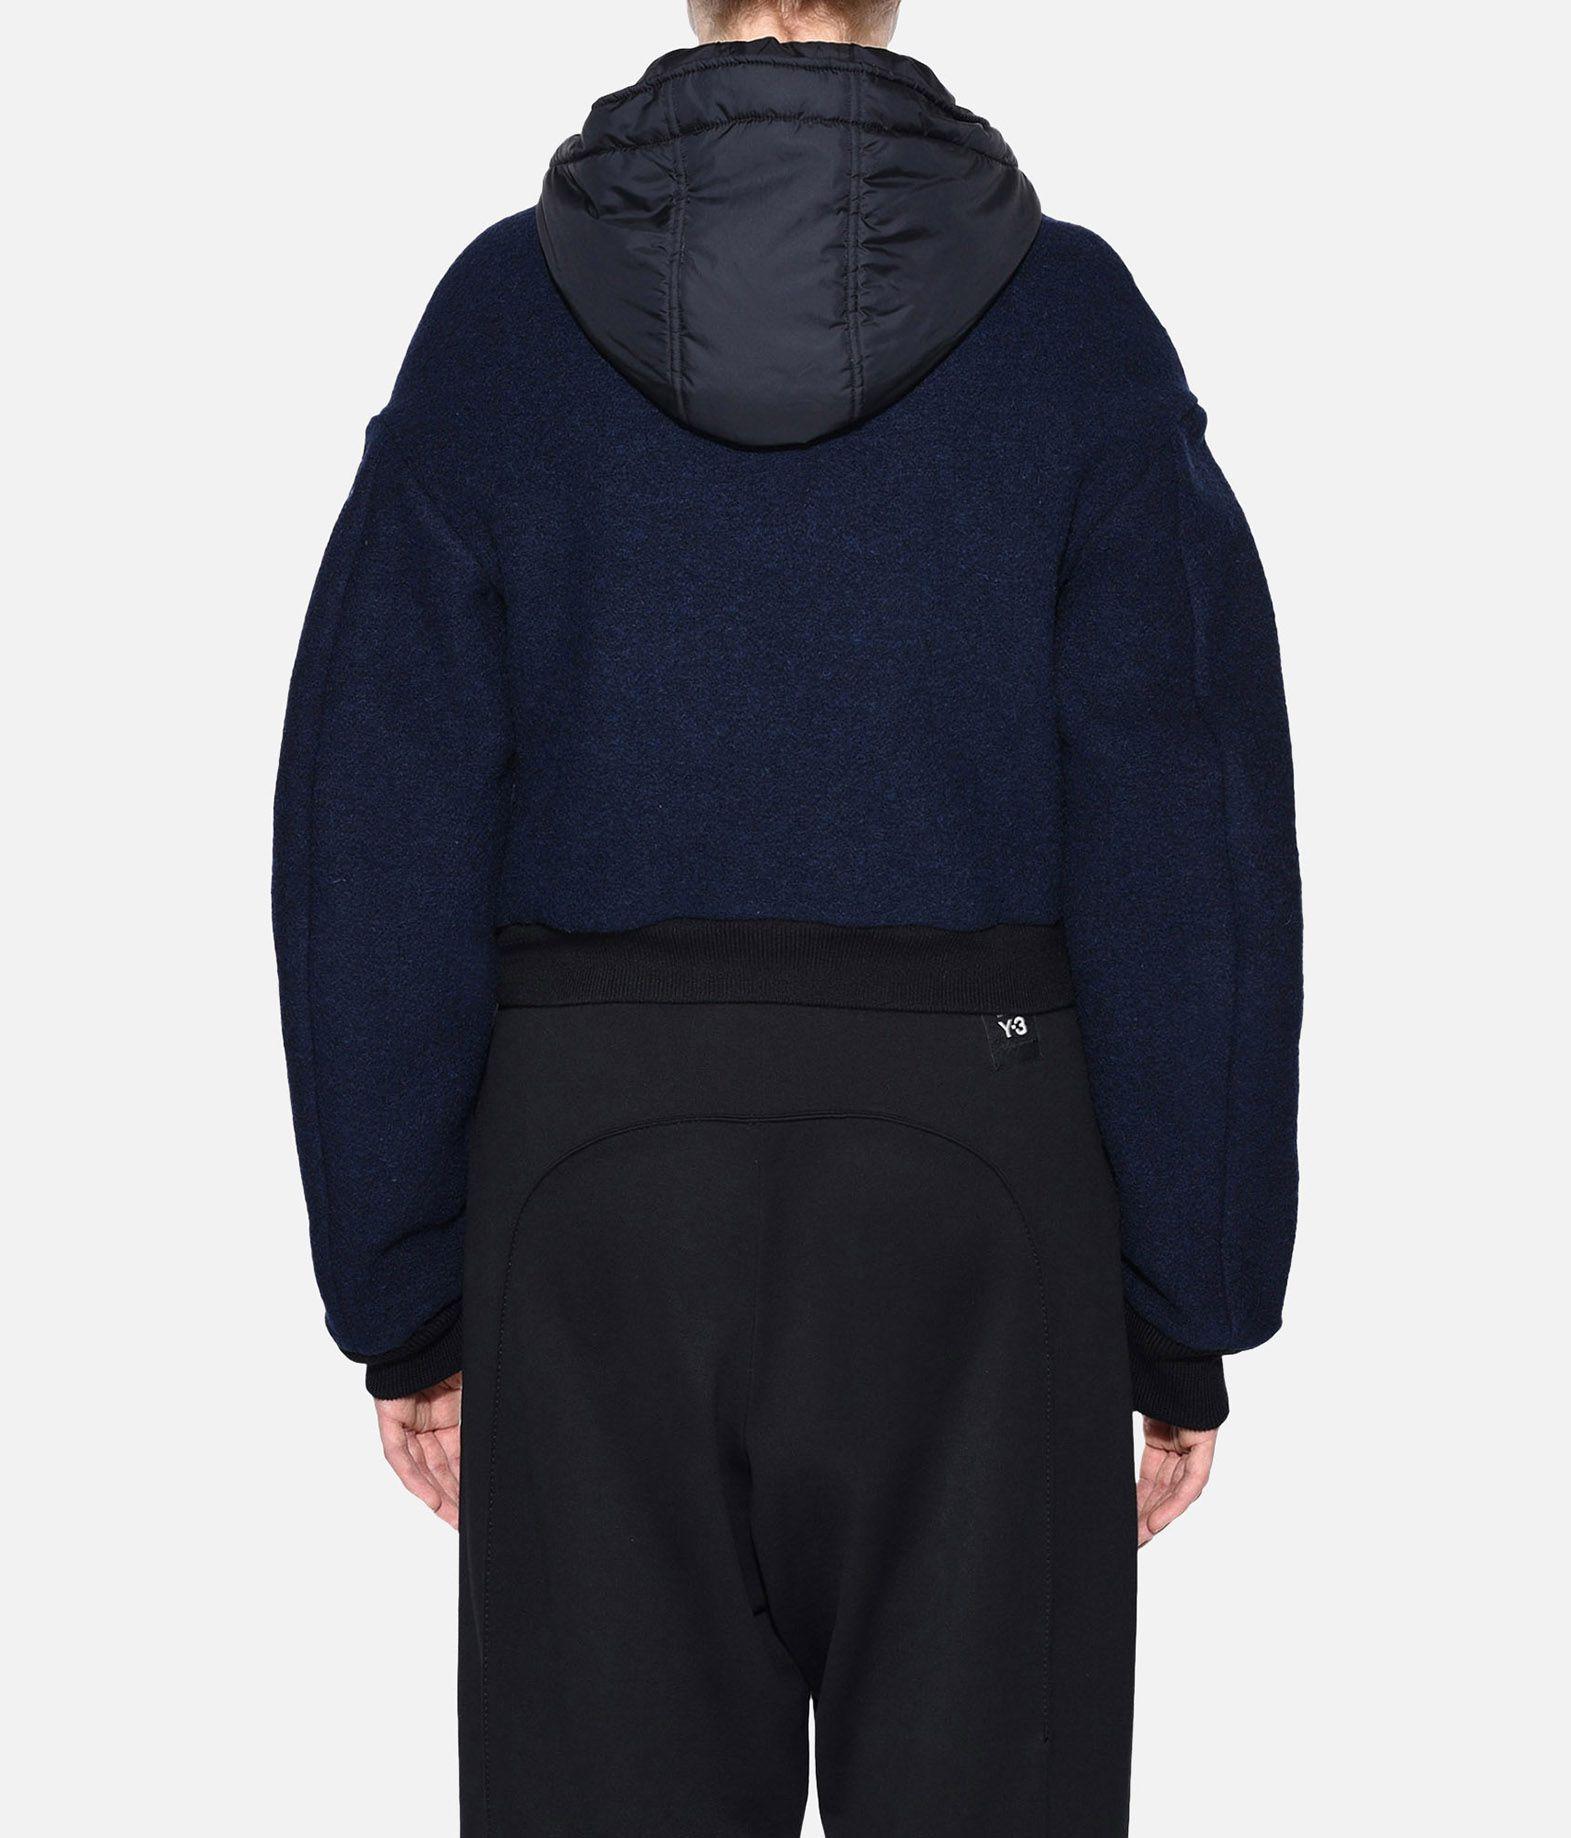 Y-3 Y-3 Wool Hoodie Jacket Giubbotto Donna d